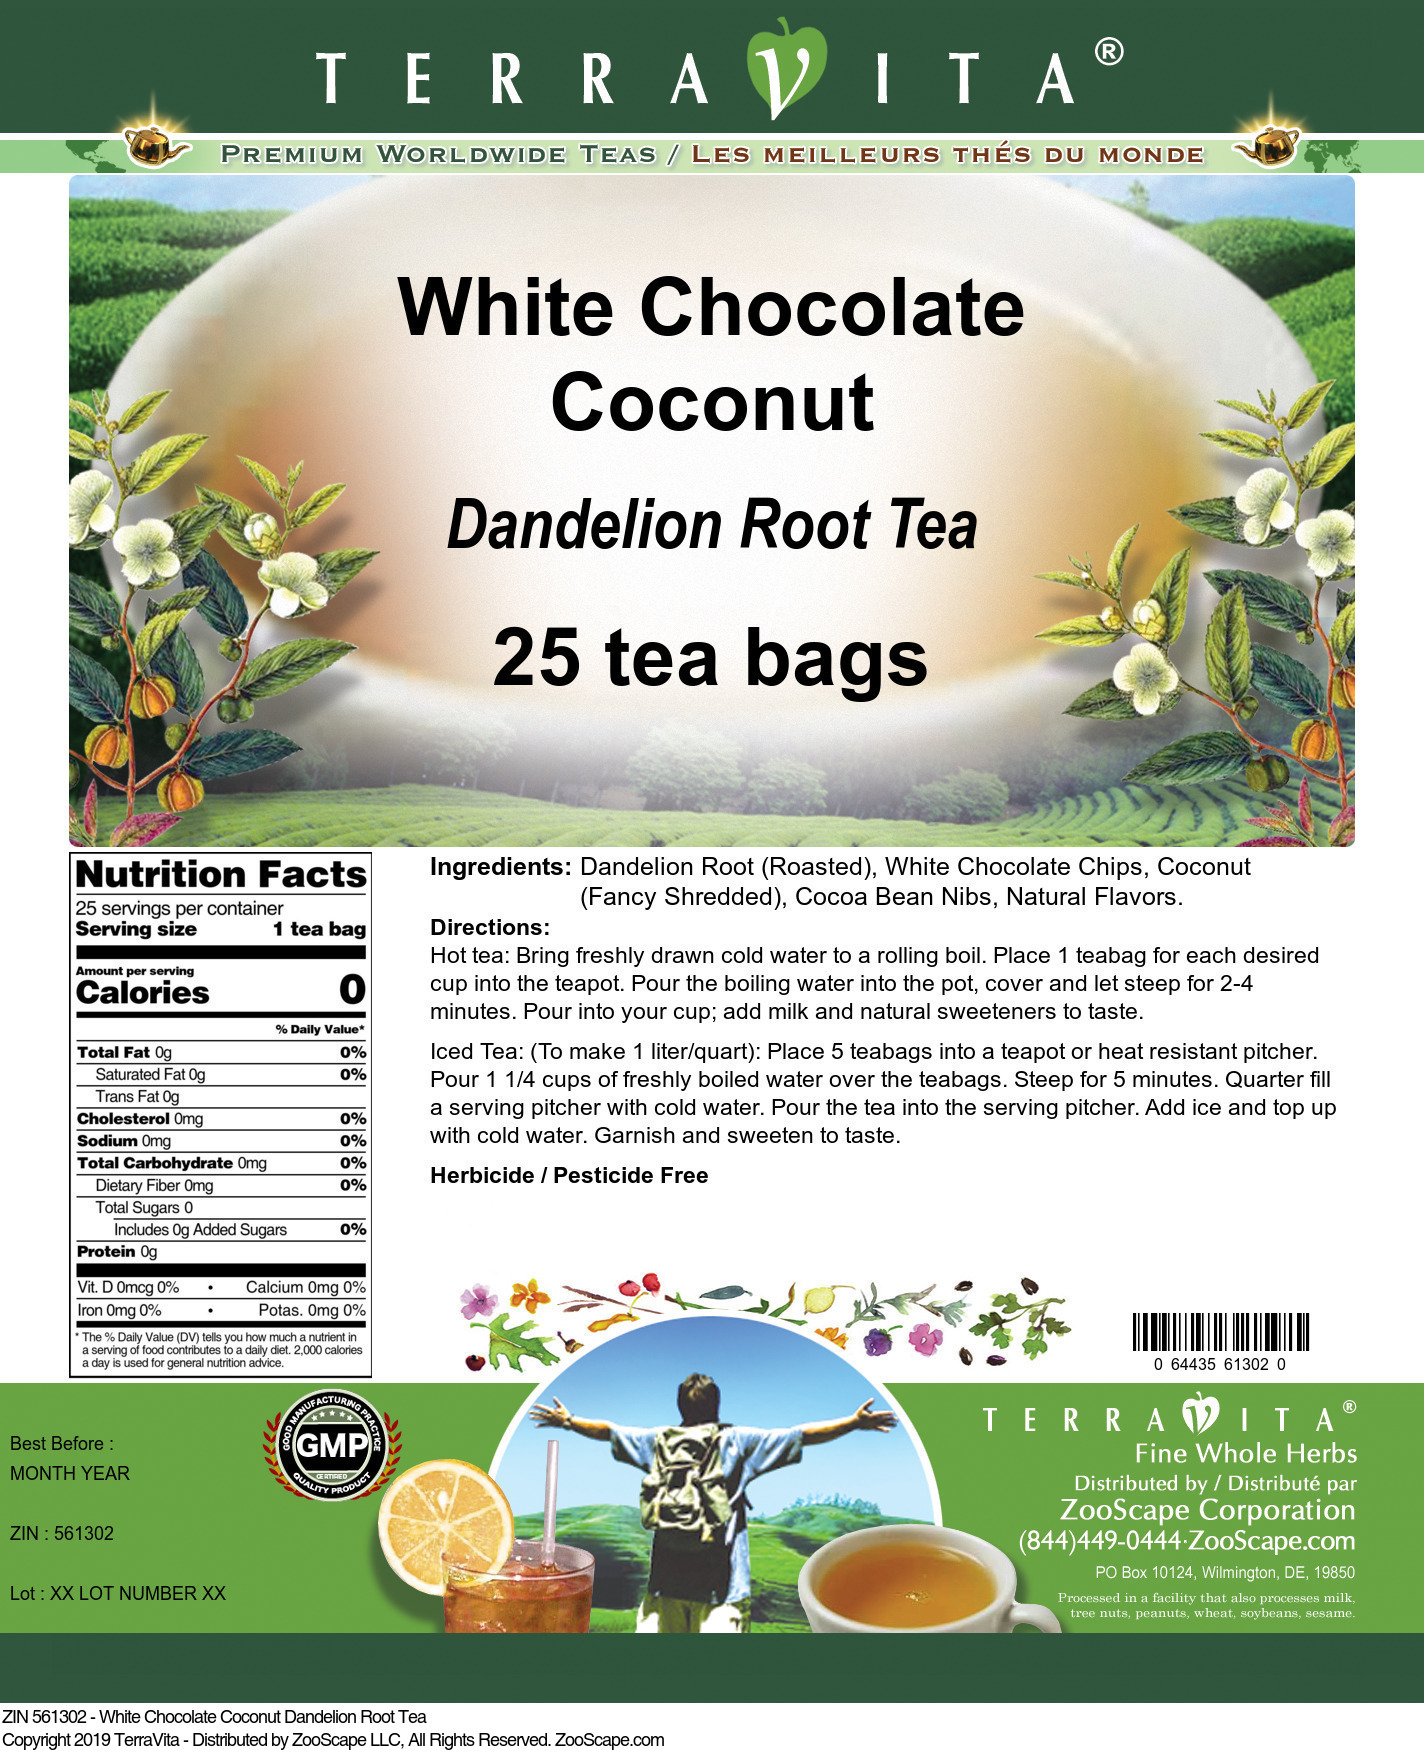 White Chocolate Coconut Dandelion Root